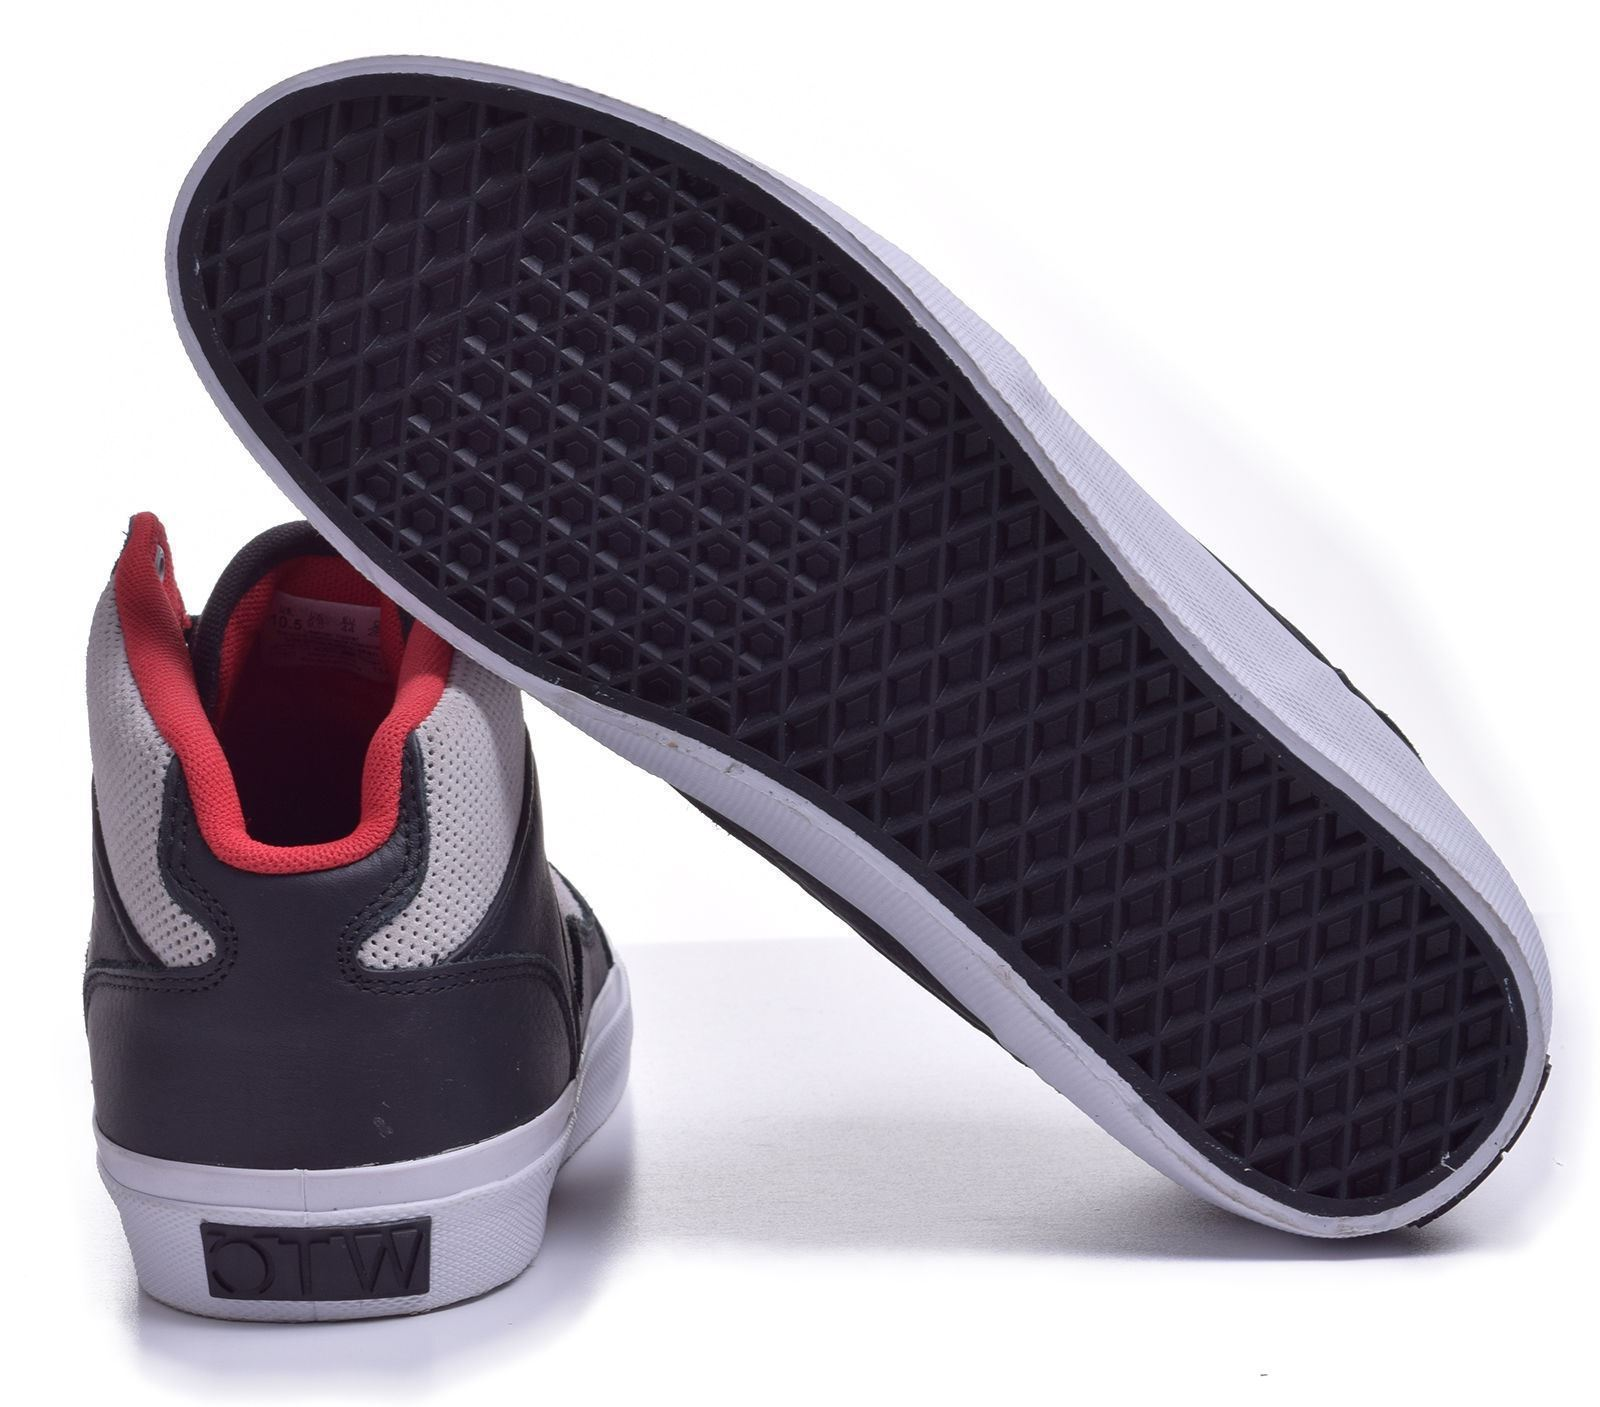 Vans Bedford (LS) Black/Moon OTW Skate Shoes MEN'S 6.5 WOMEN'S 8 image 4